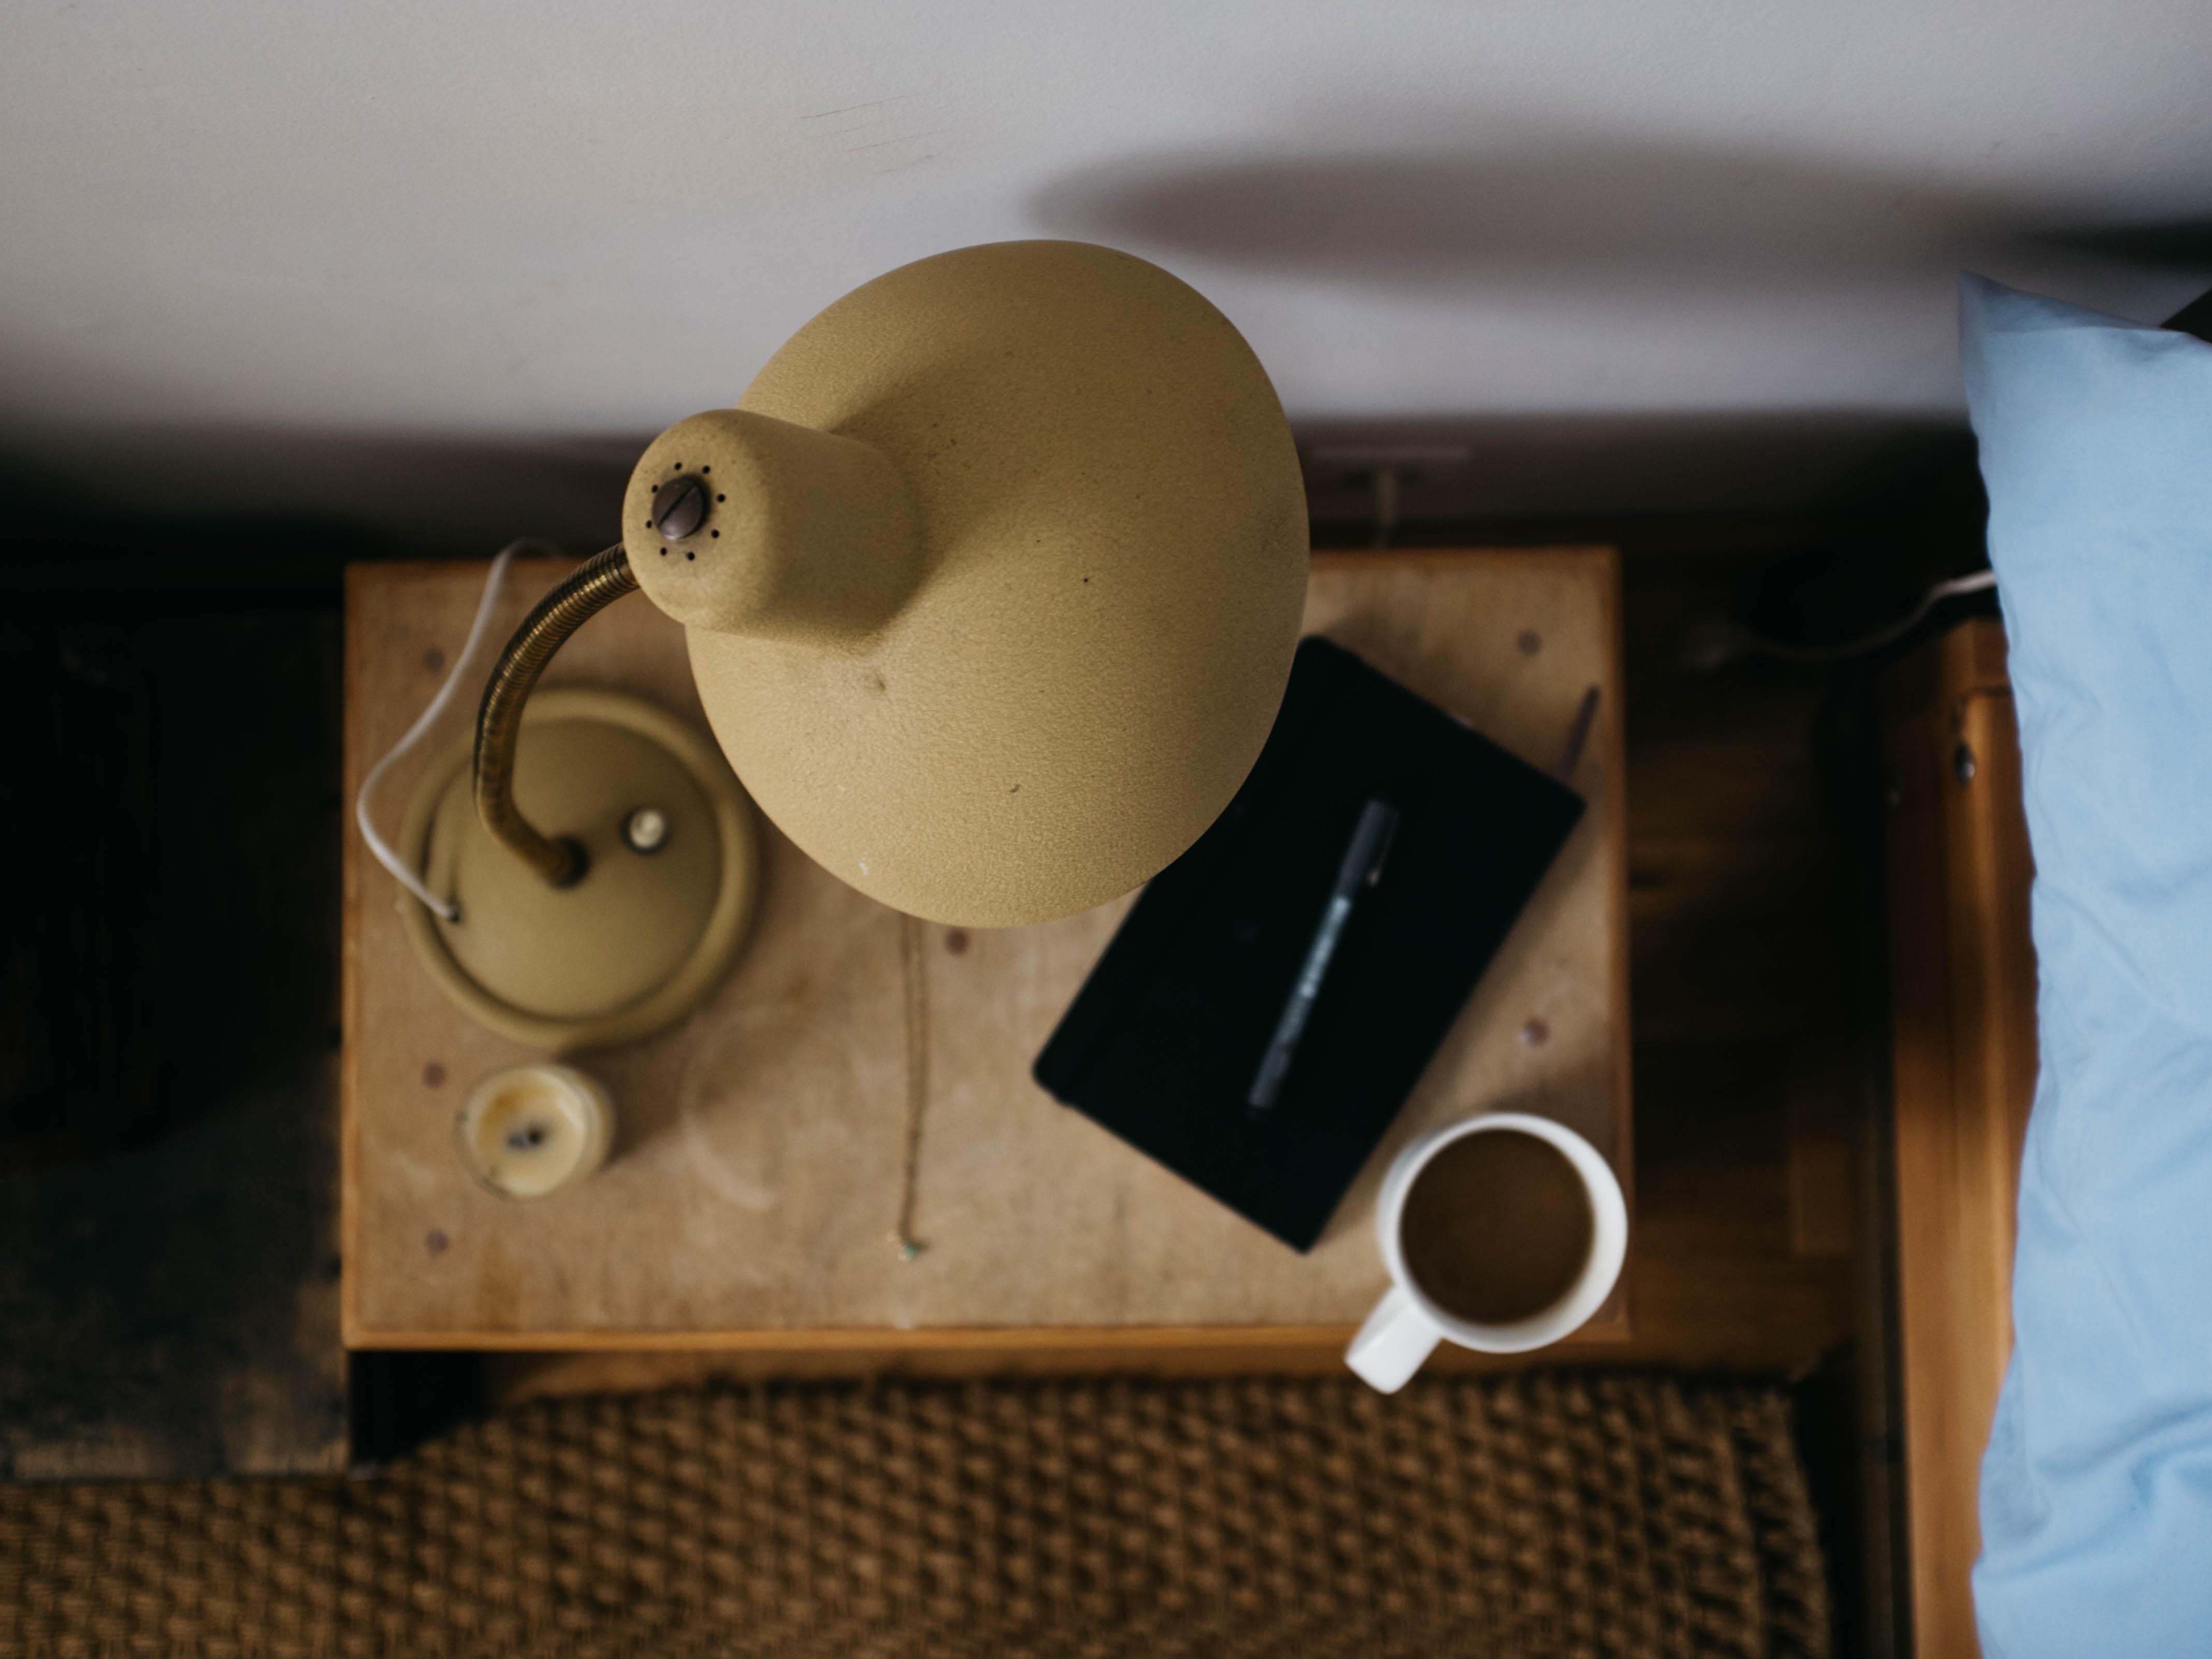 beige gooseneck desk lamp on table